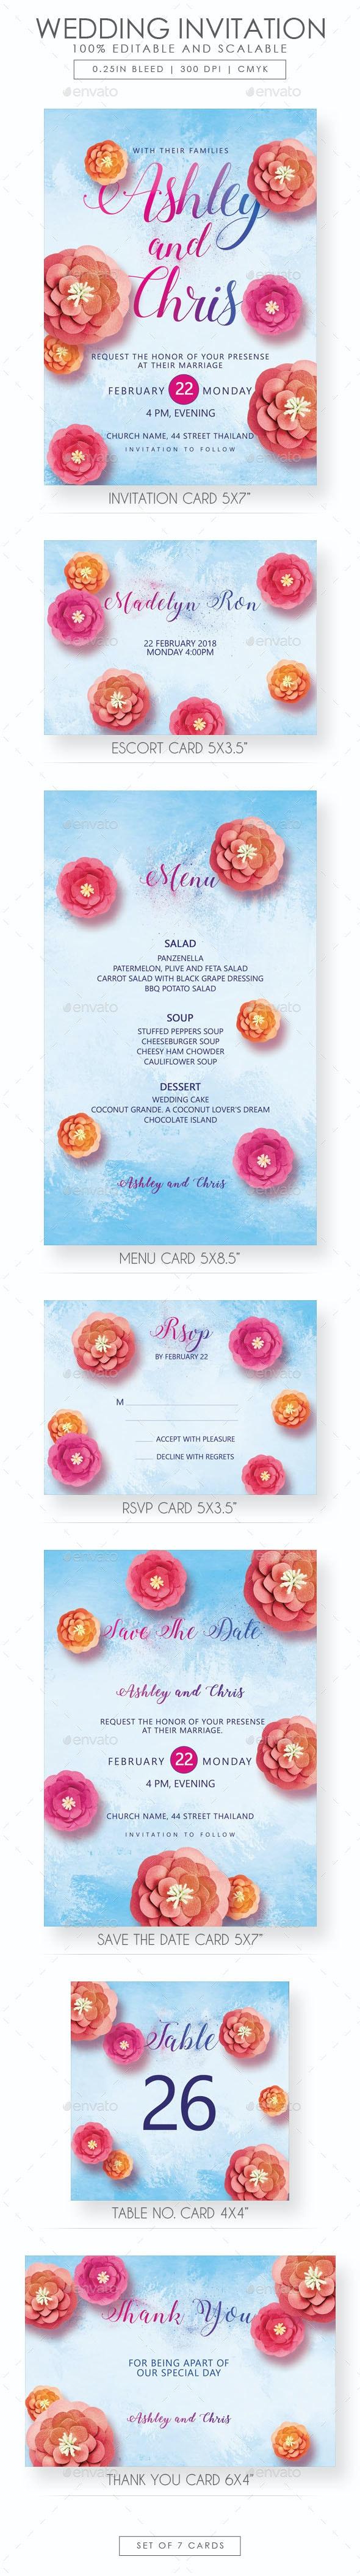 Floral Wedding Invitation Suite - Wedding Greeting Cards